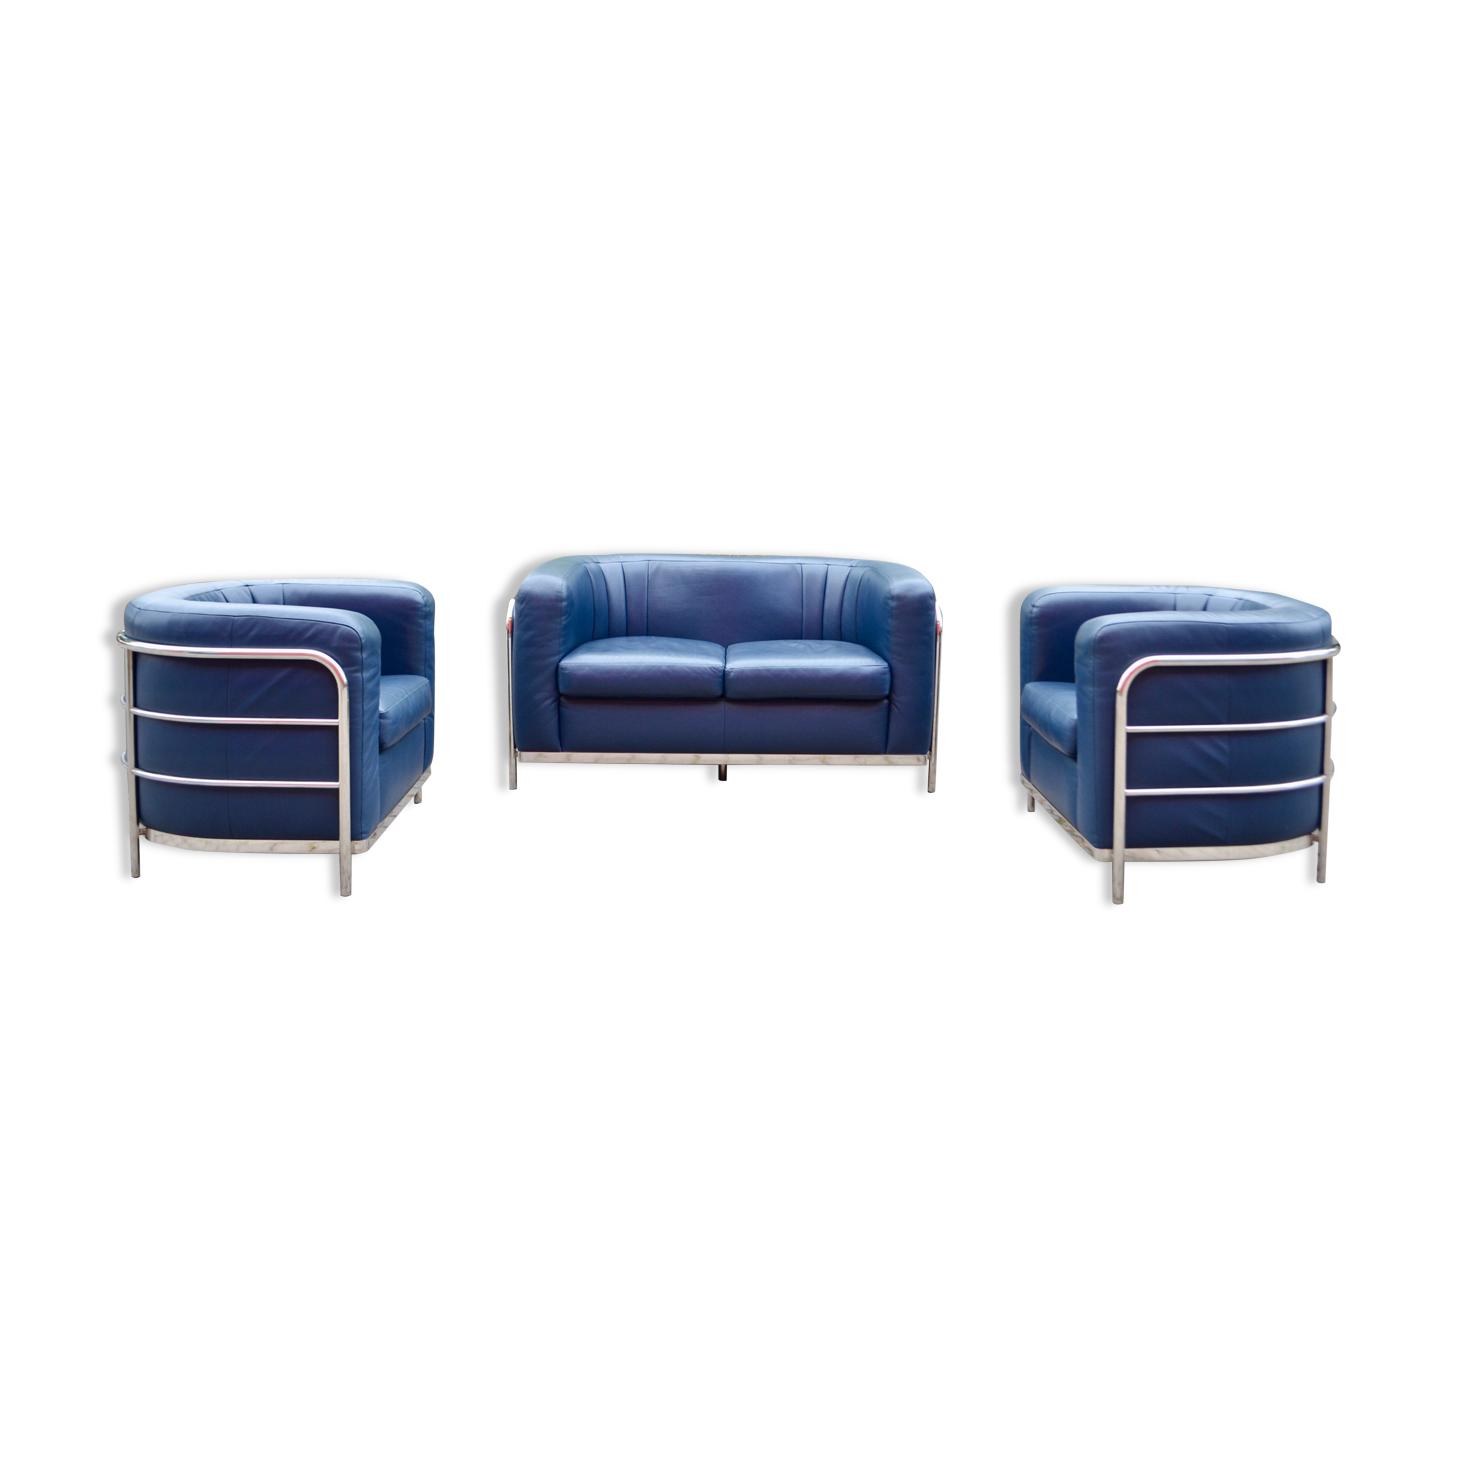 Ensemble canapé & 2 fauteuils en cuir bleu Zanotta Onda